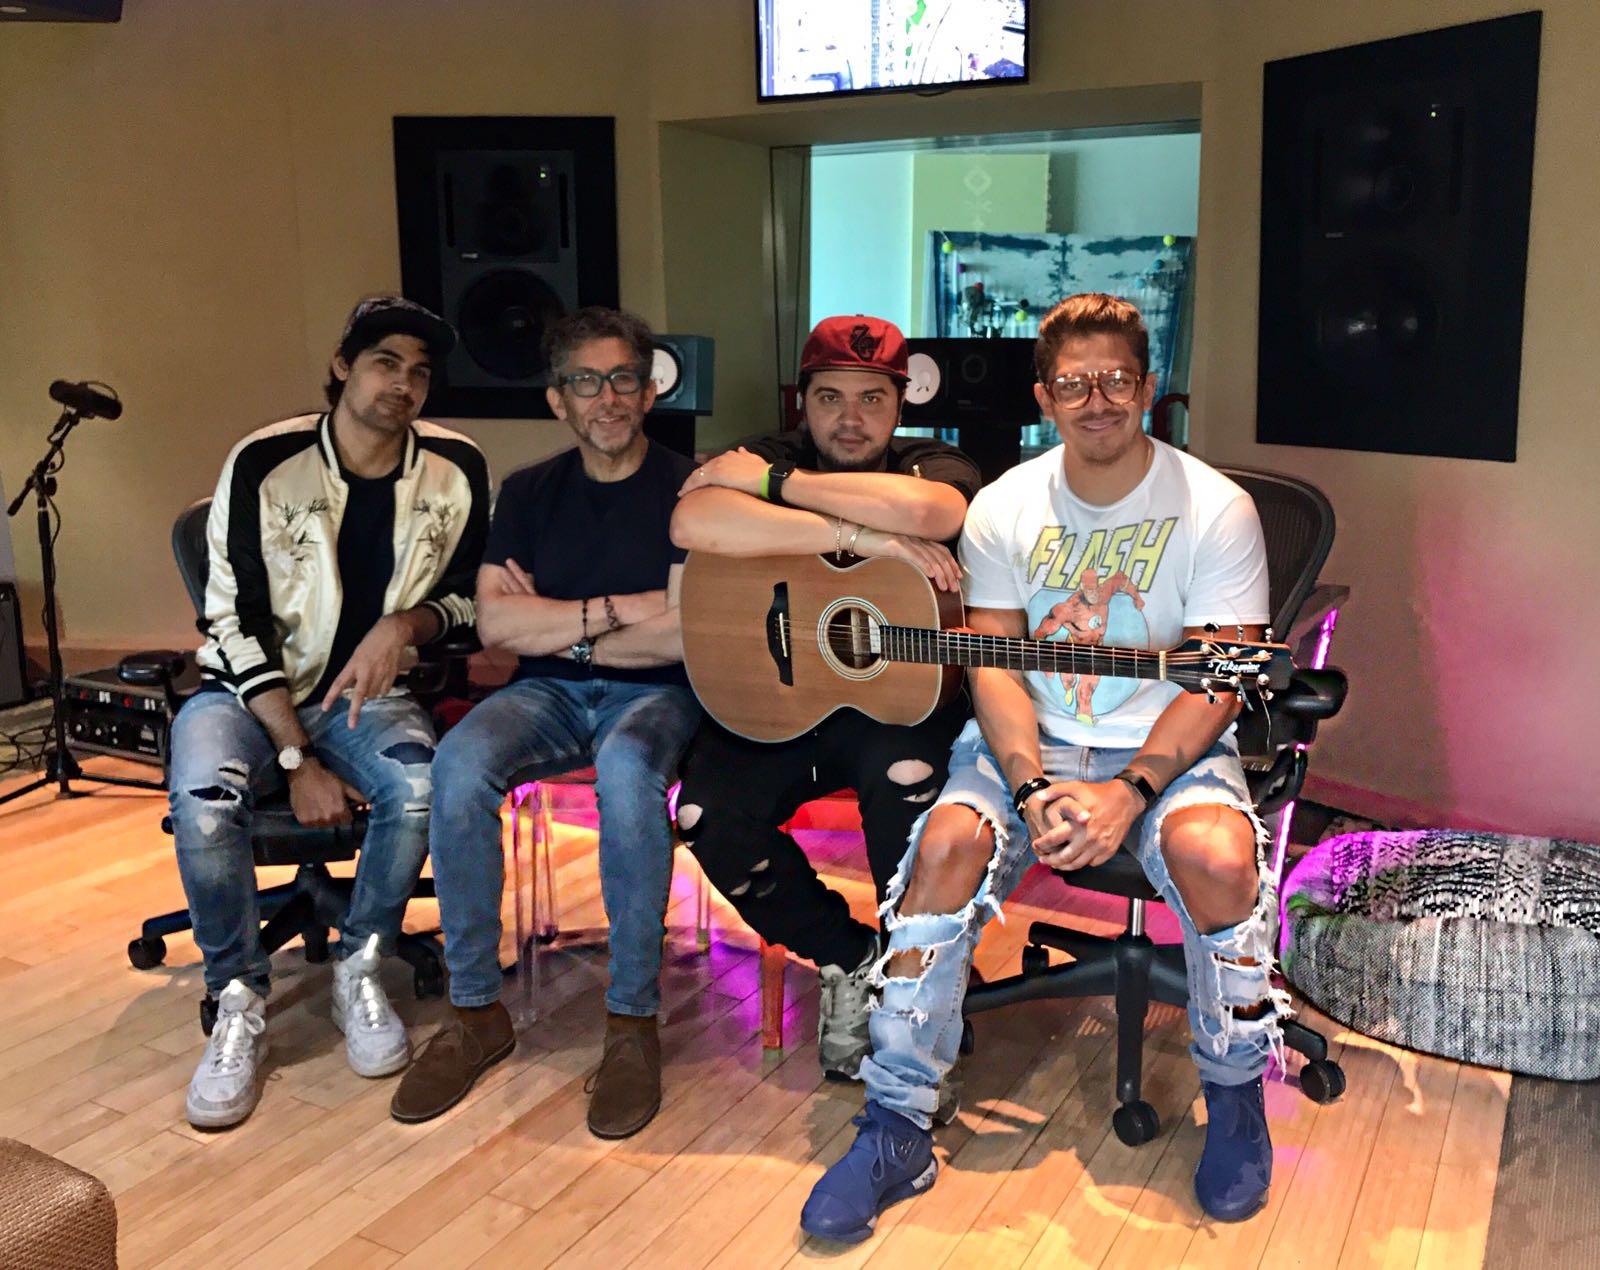 Jon, Yasmil, Frank, Oscarcito